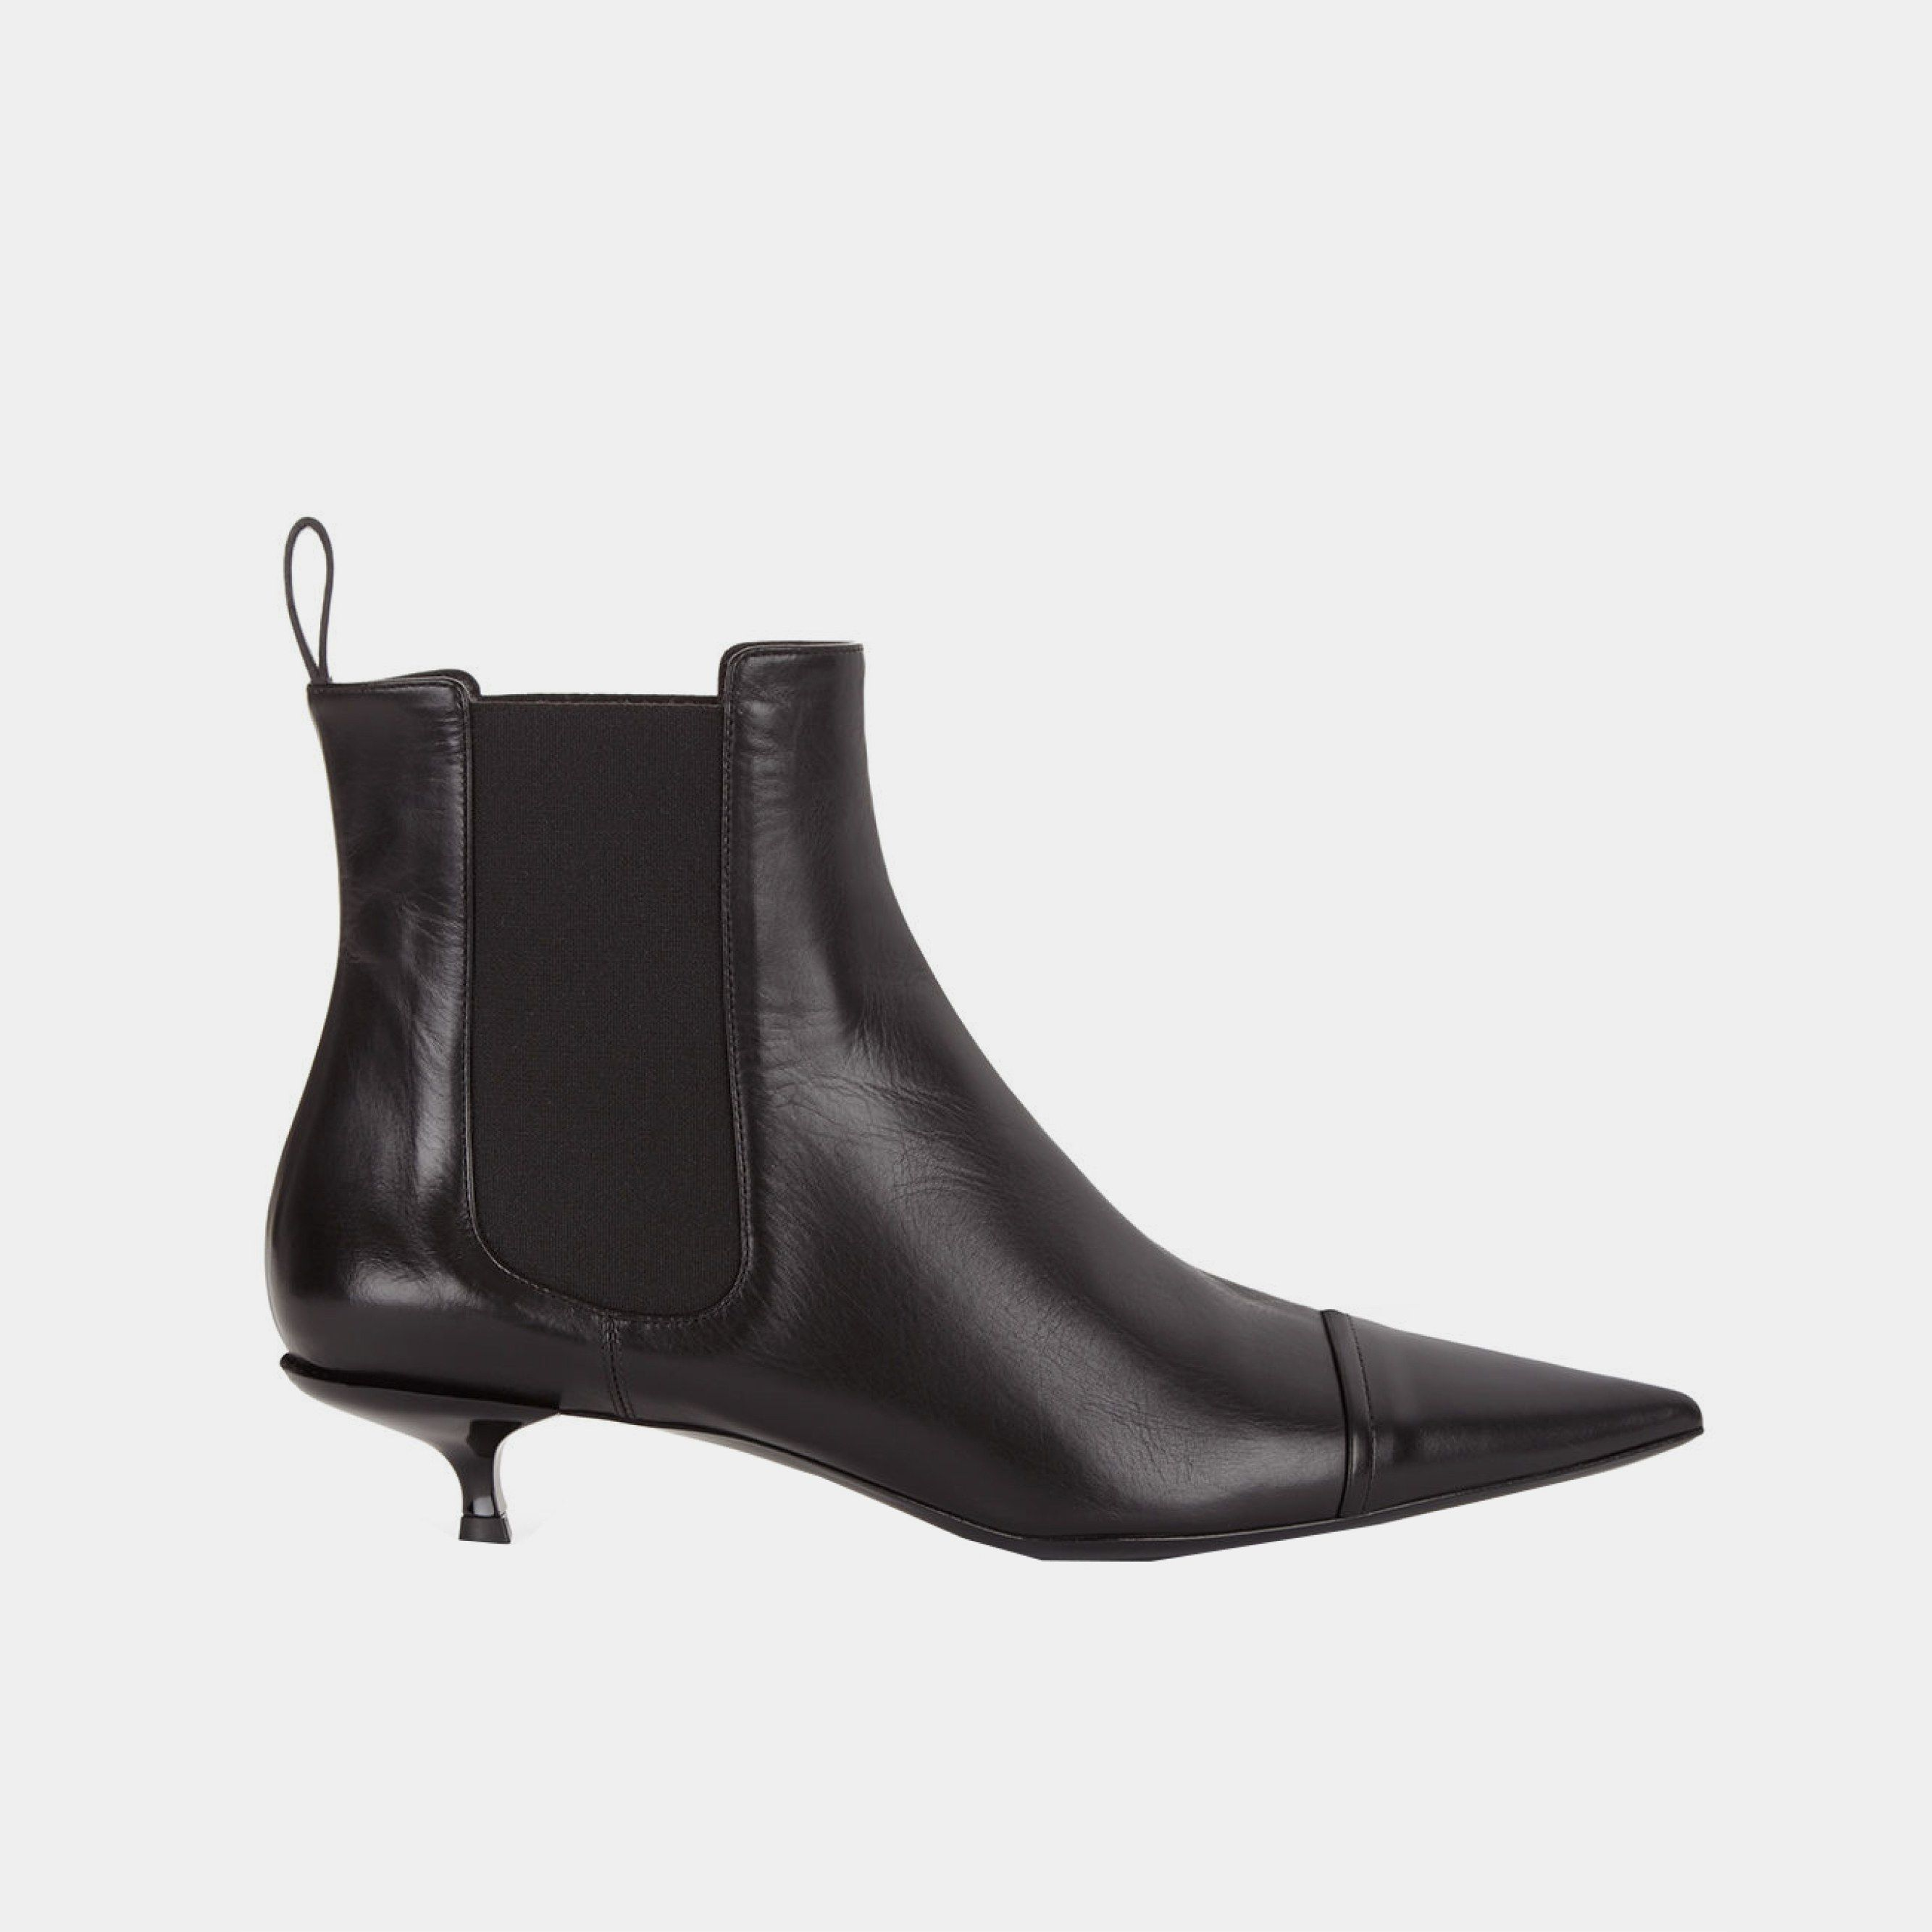 Jil Sander Black Dixie Pointed Kitten Heel Boots 392 Boots Kitten Heel Boots Kitten Heels